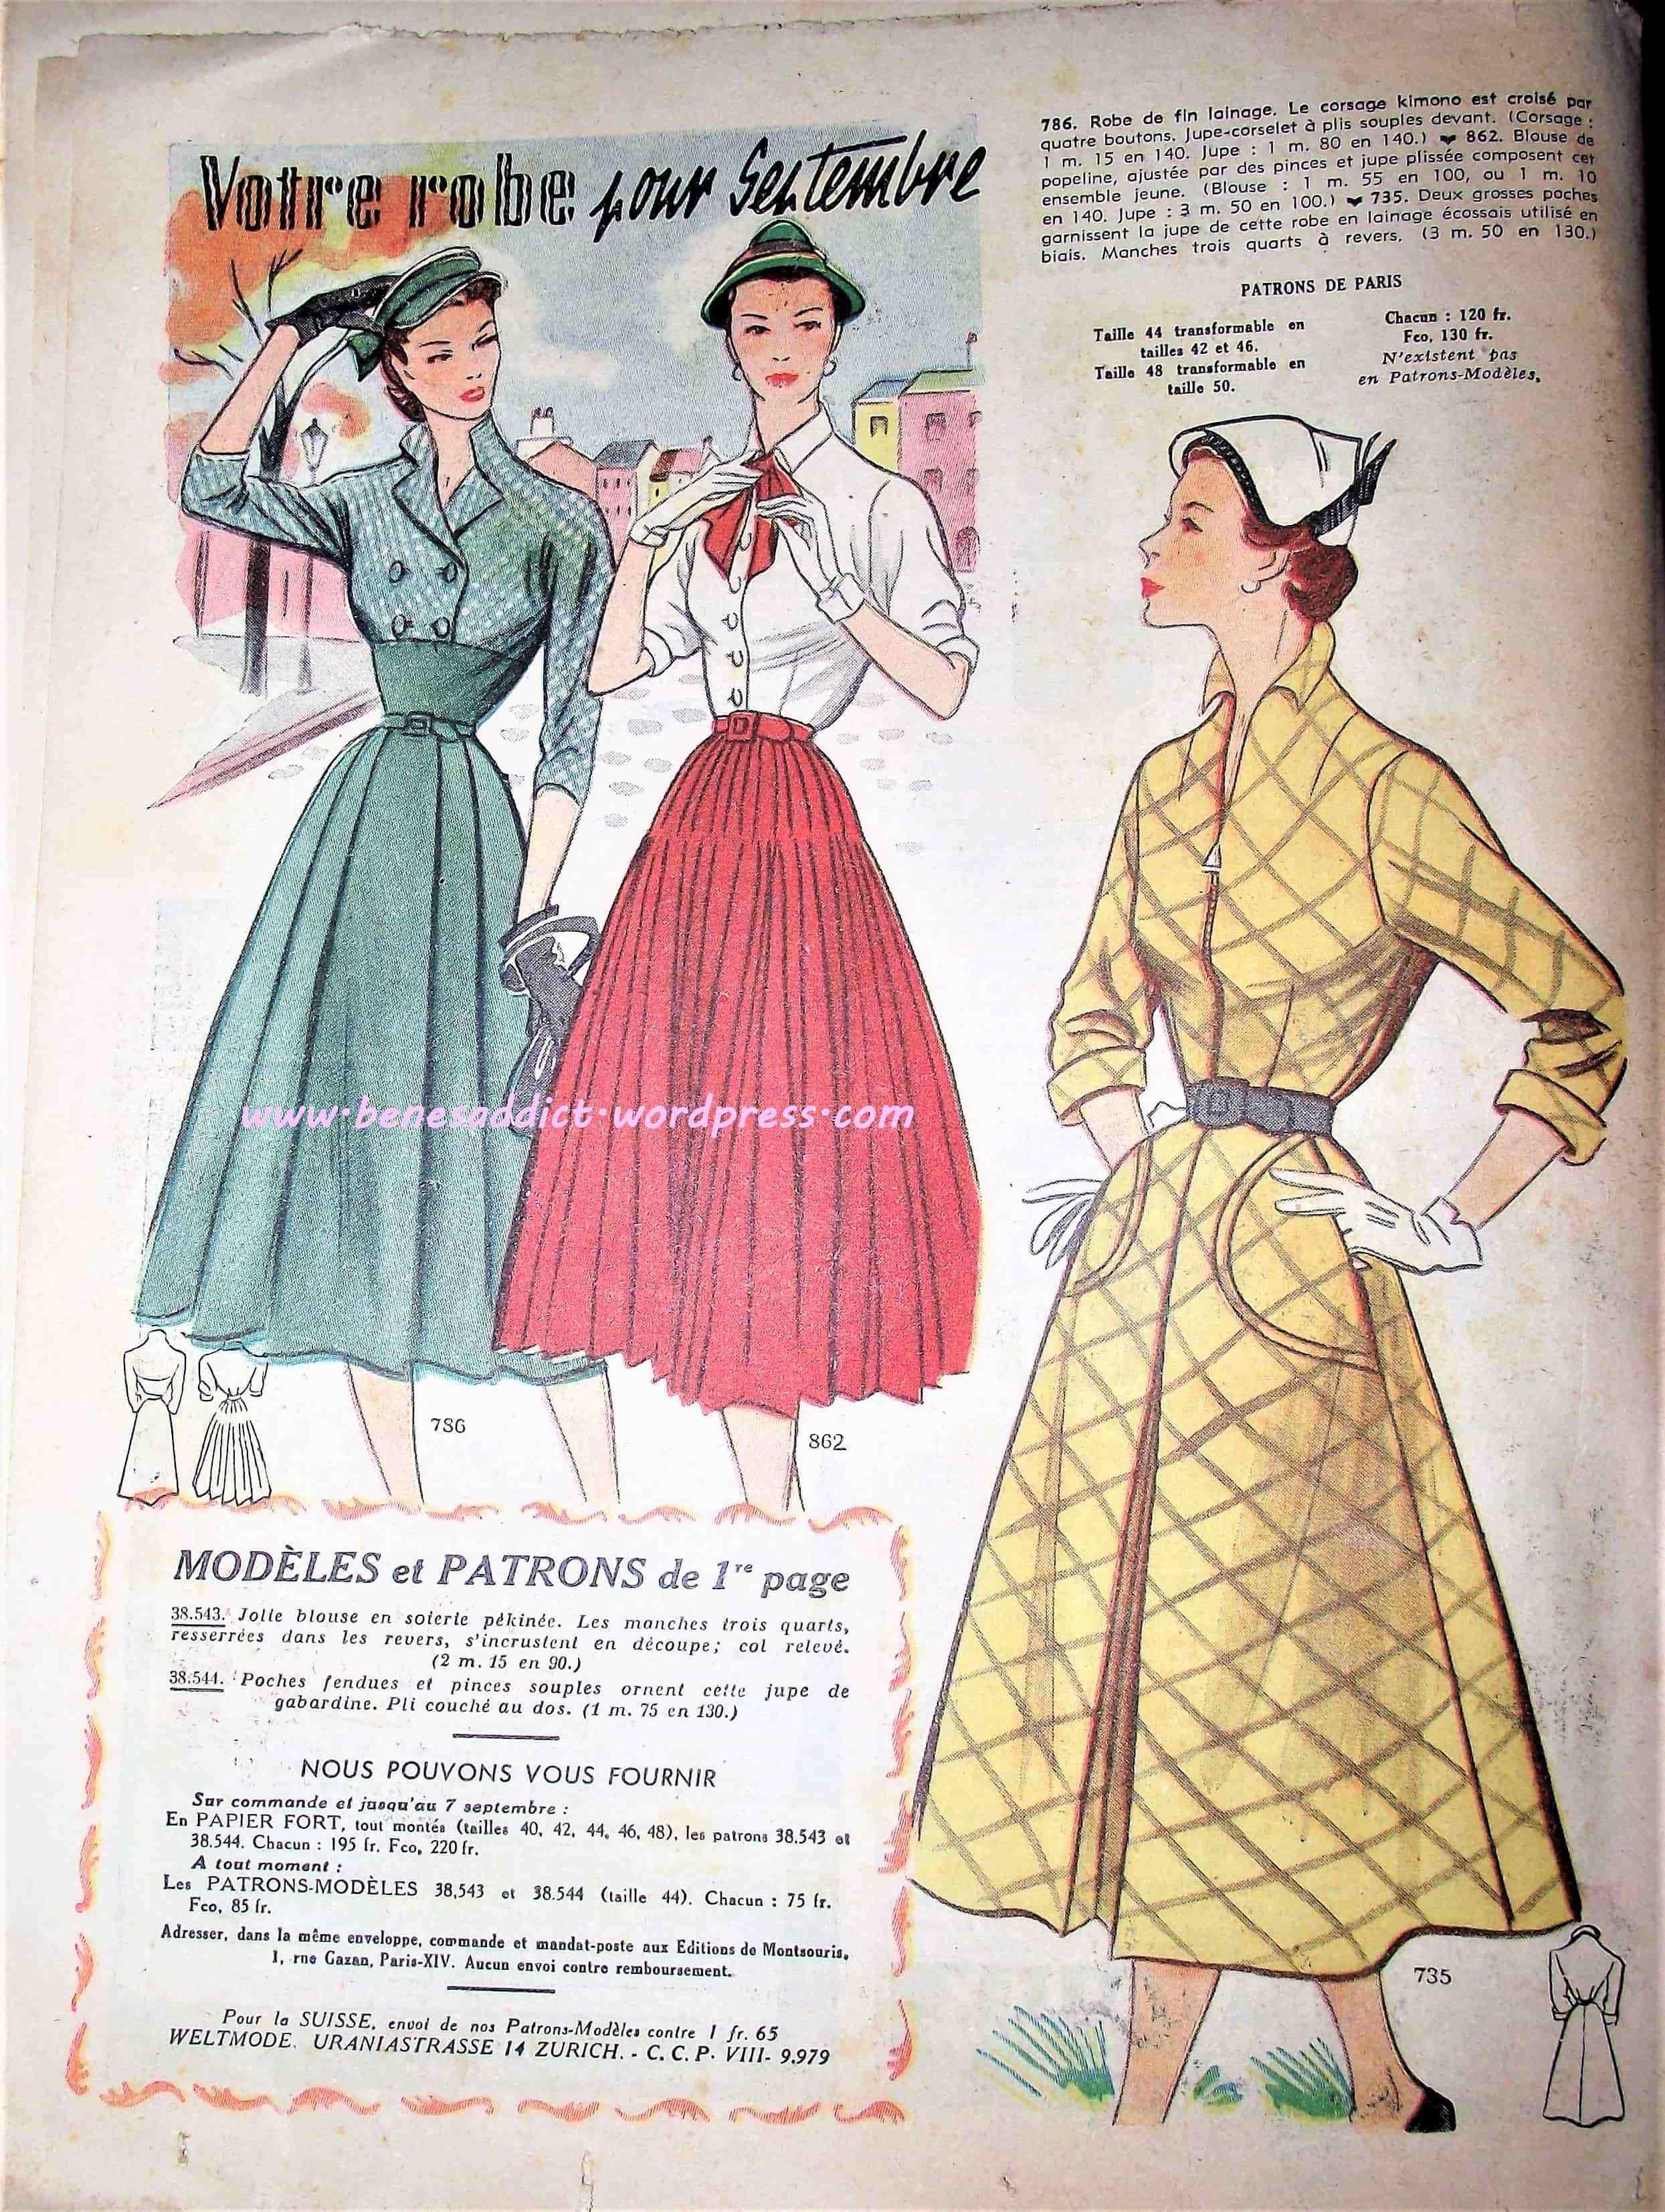 DSCF2914-мин 1950s Outfits df1934e8a